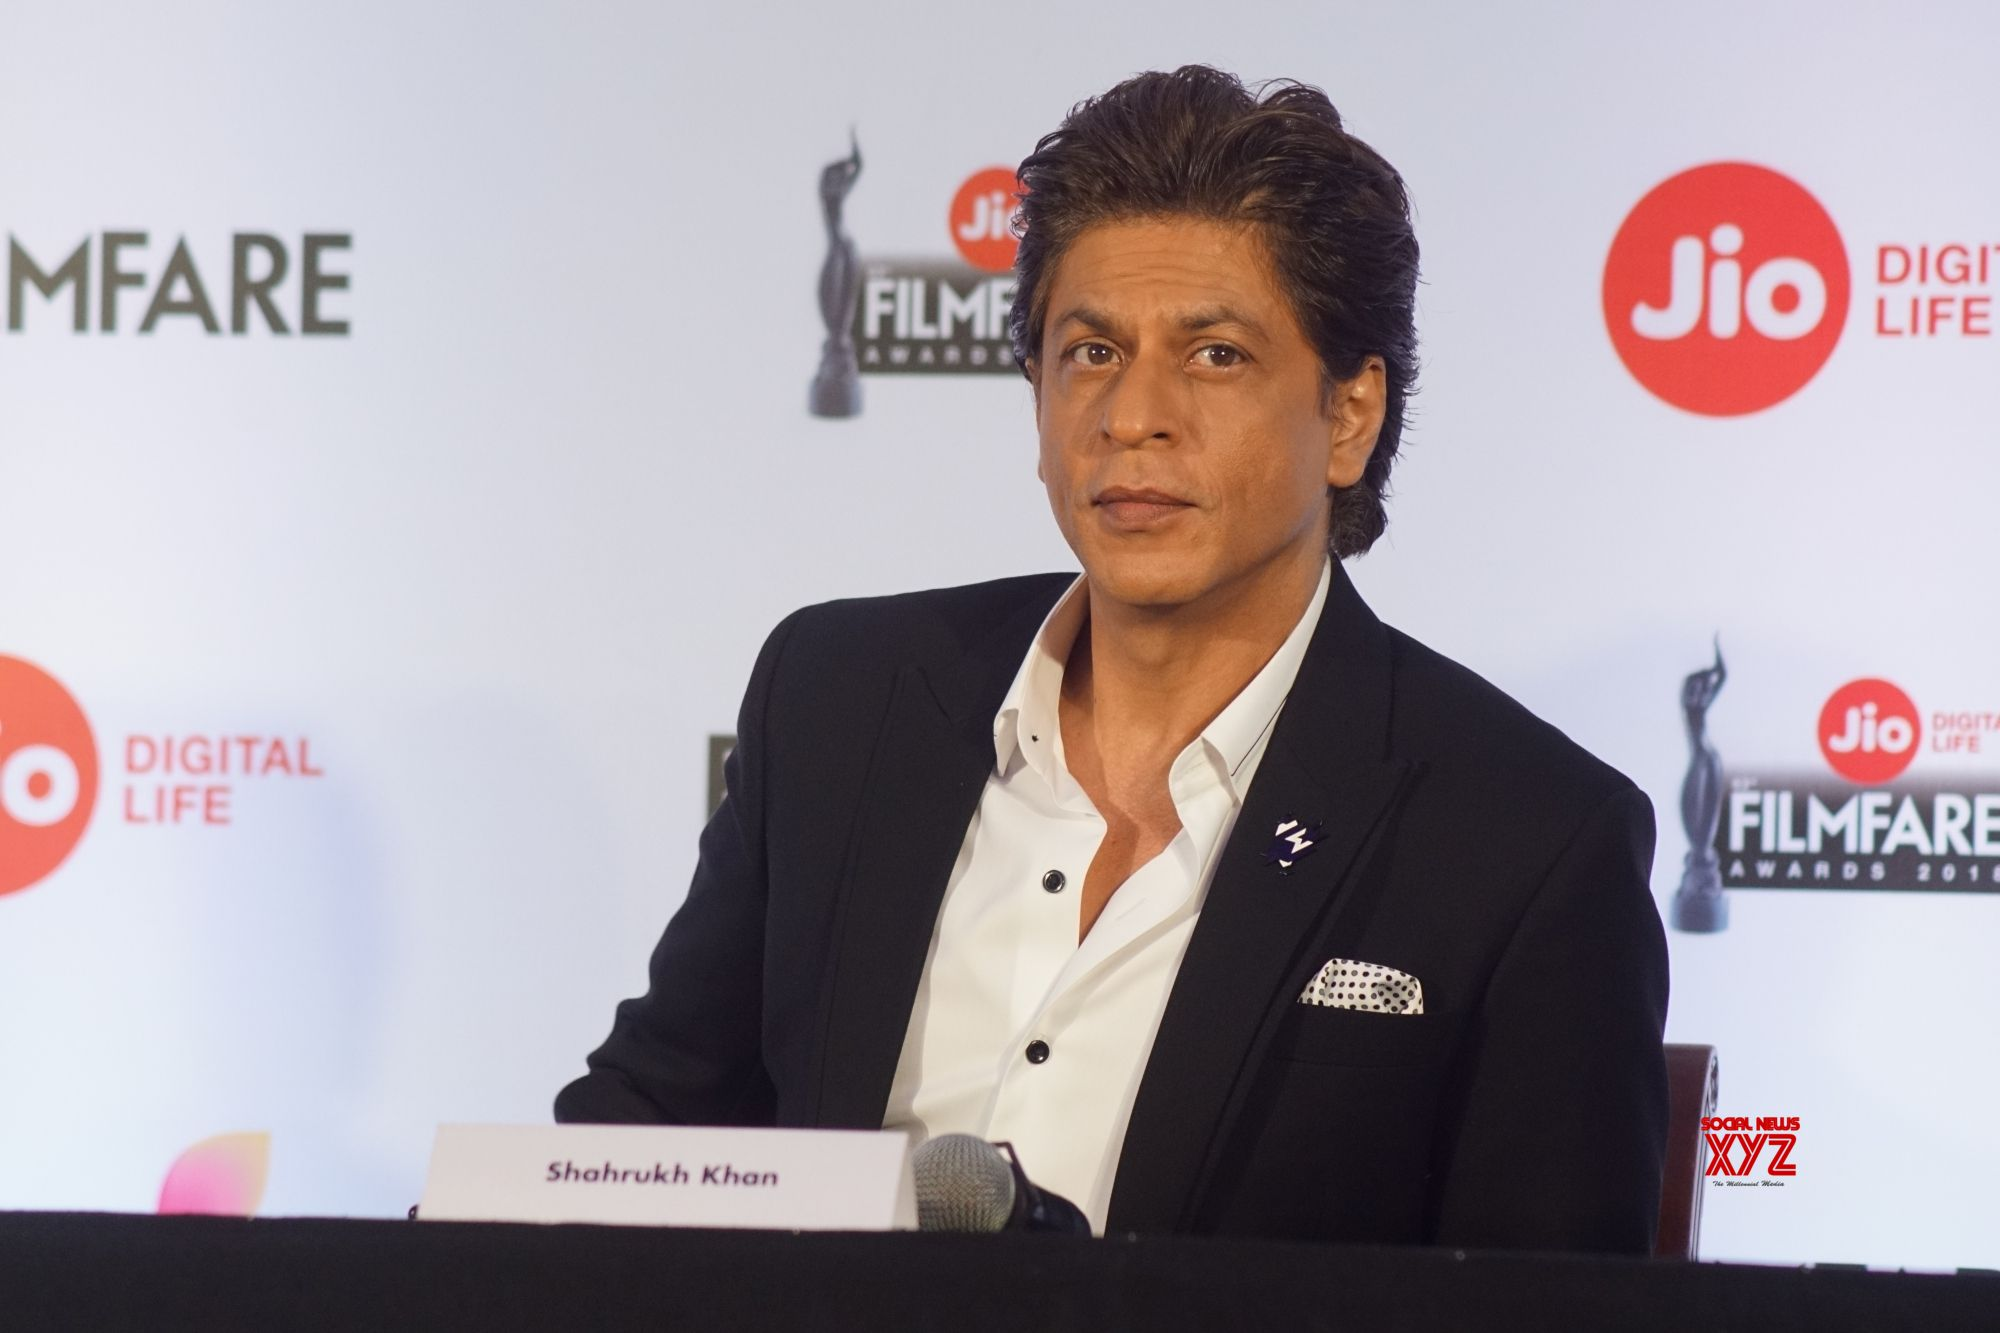 Mumbai: Press conference of Jio Filmfare Awards 2018 Shah